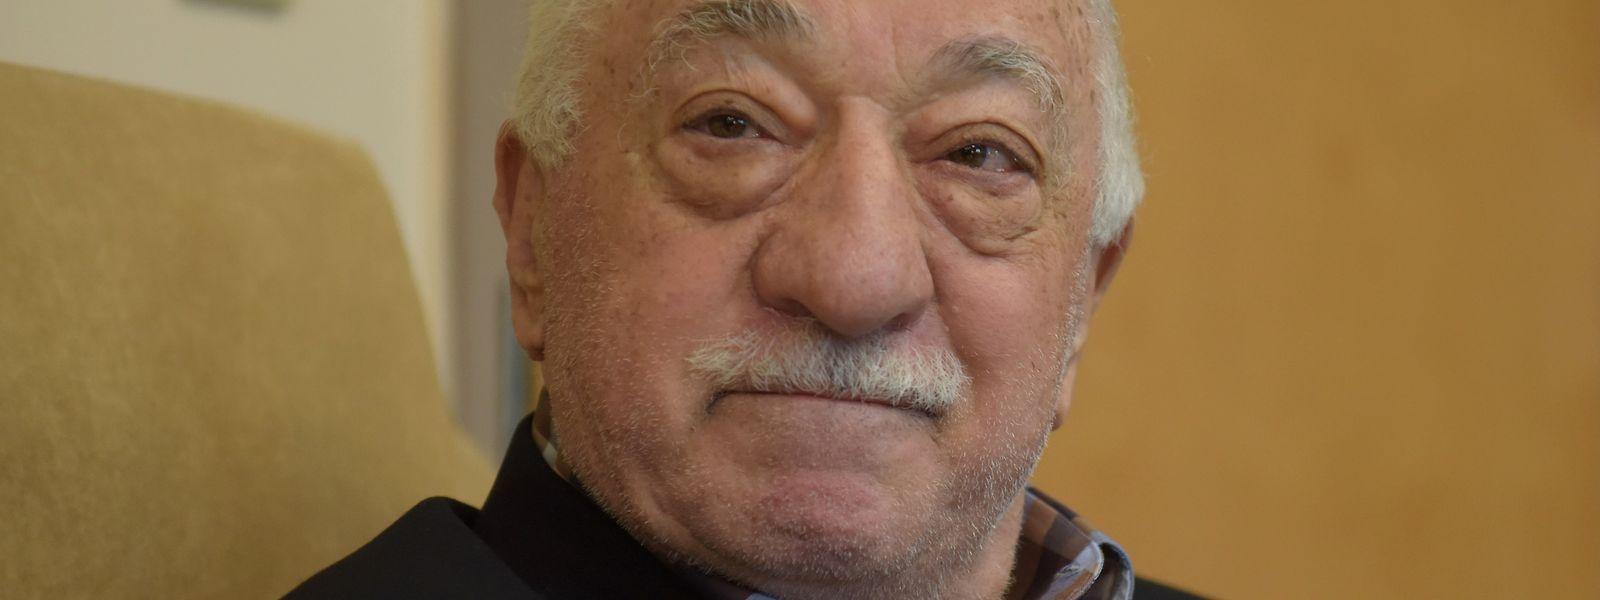 Der türkische Prediger Fethullah Gülen.